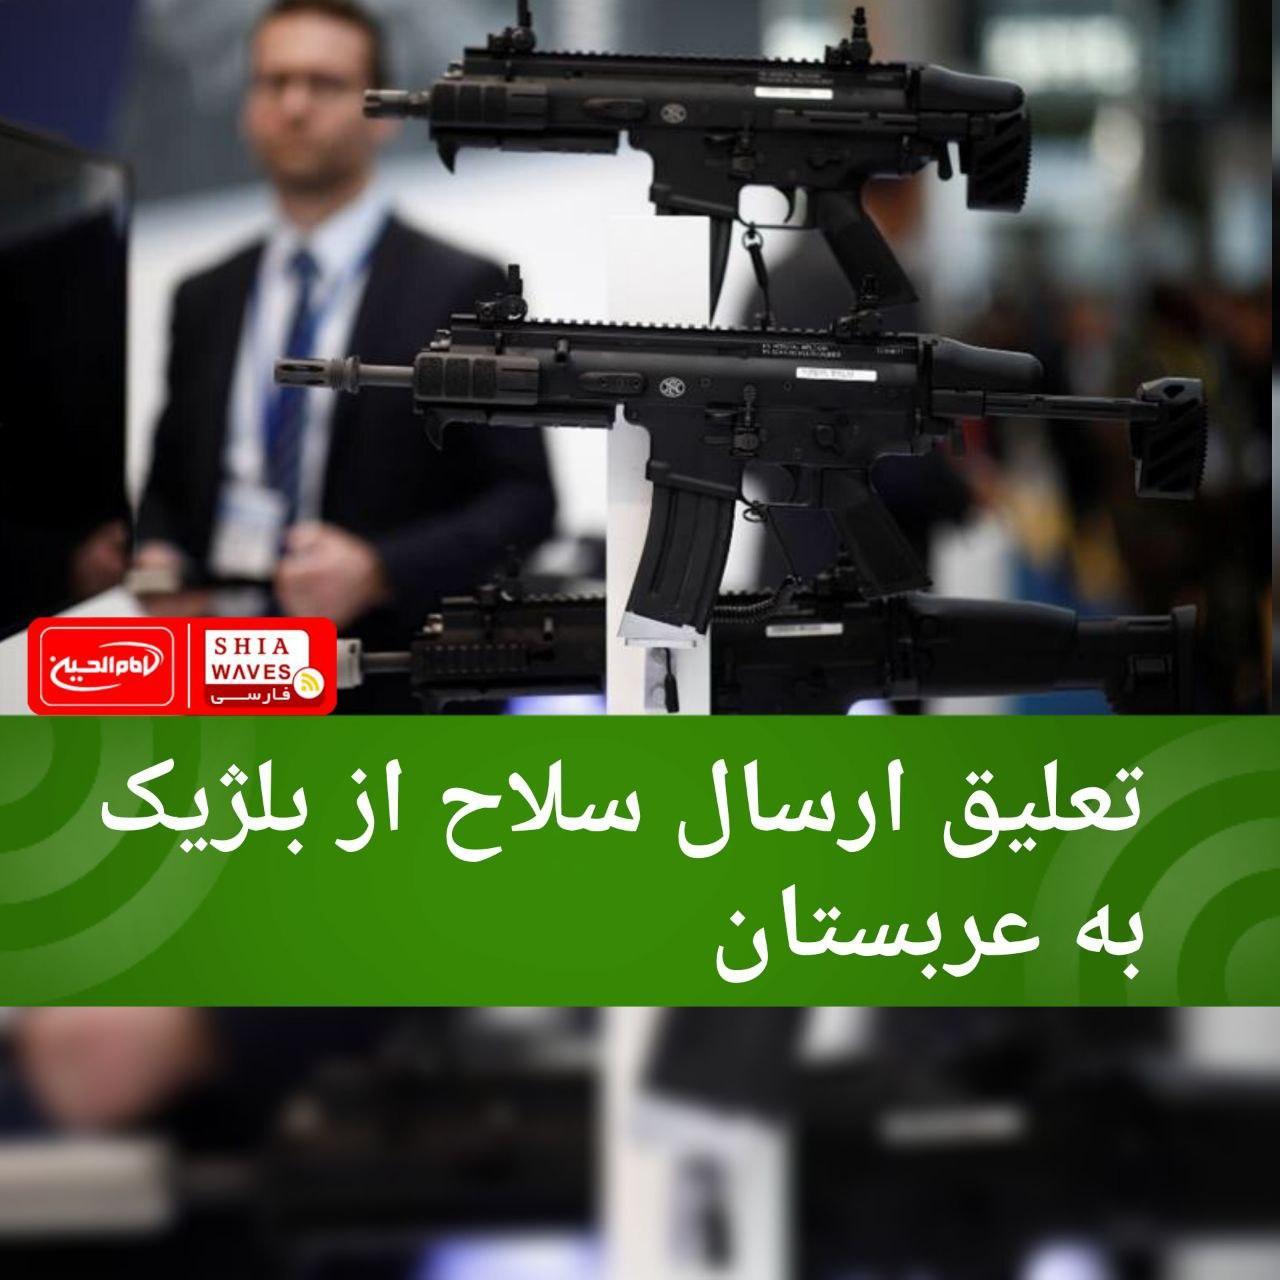 تصویر تعليق ارسال سلاح از بلژيک به عربستان